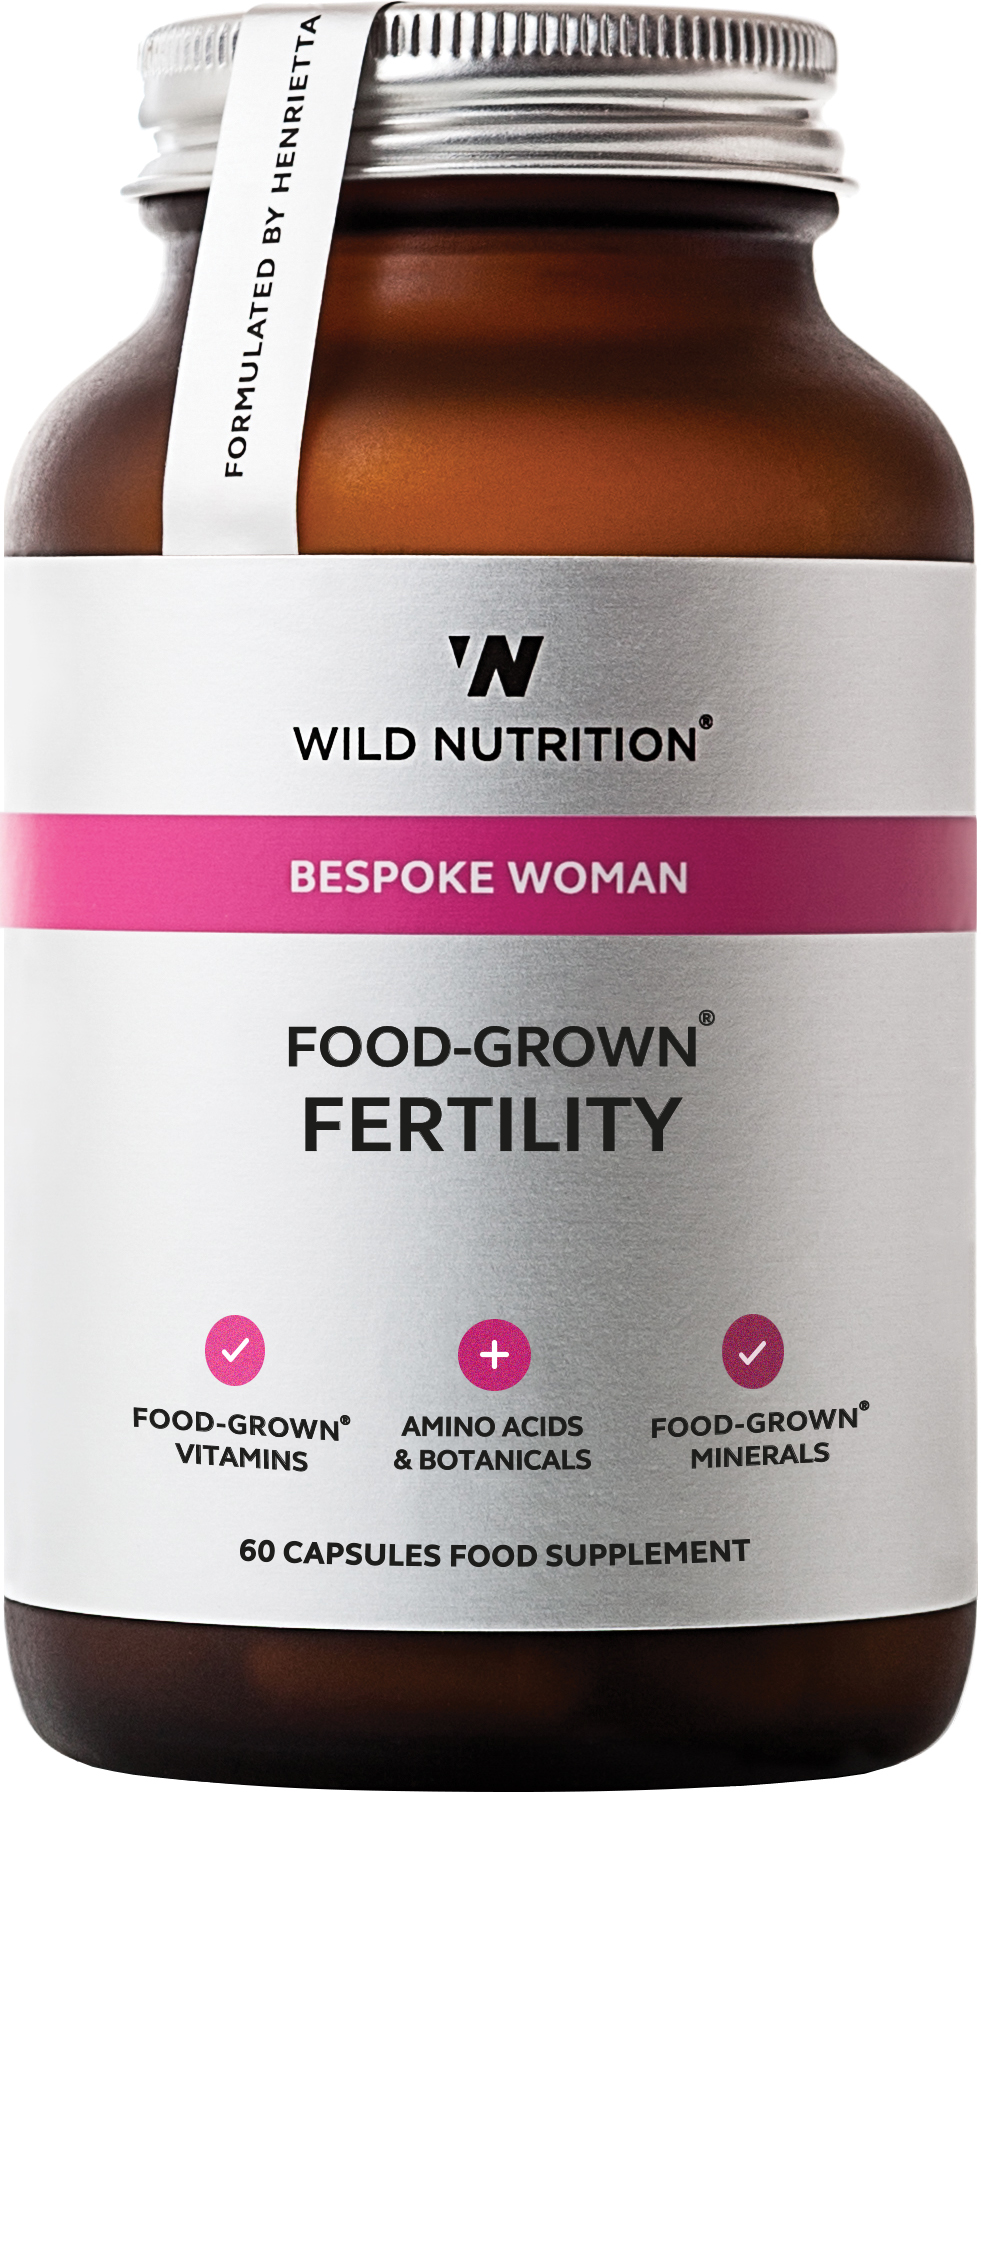 Bespoke Woman Food-Grown Fertility 60's